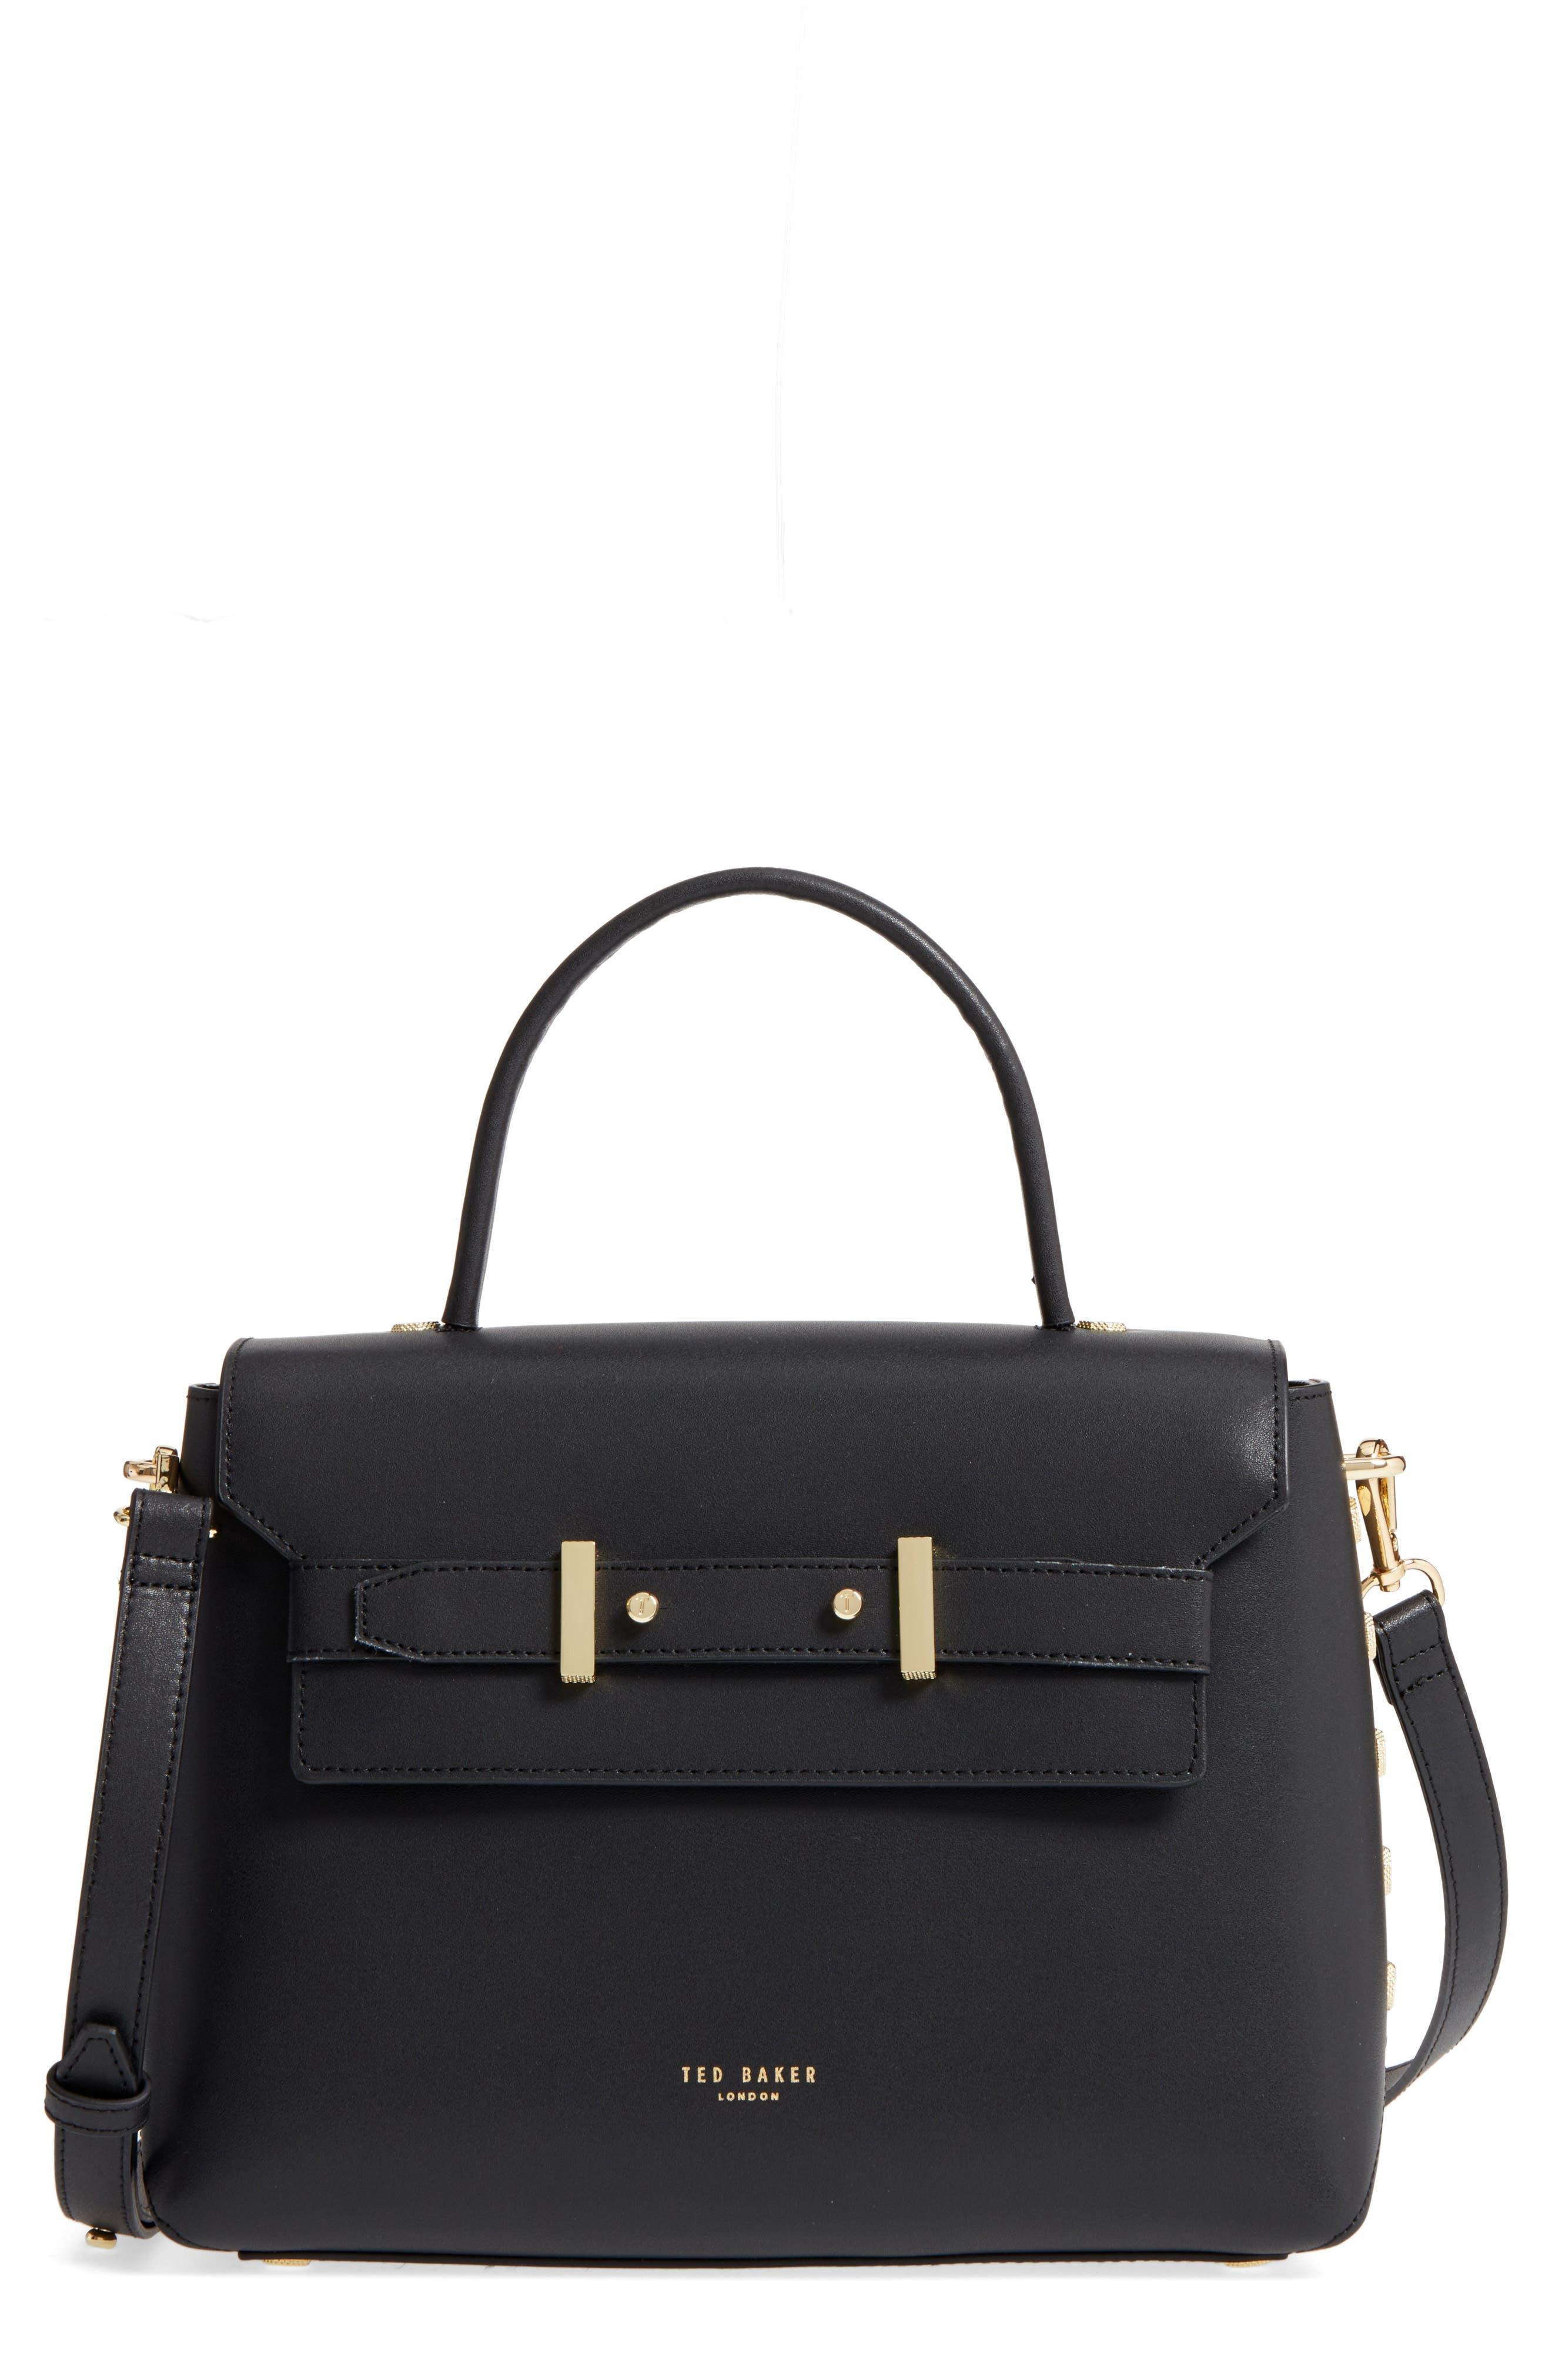 Taymar - Studded Edge Lady Bag Leather Top Handle Satchel,                         Main,                         color, 001